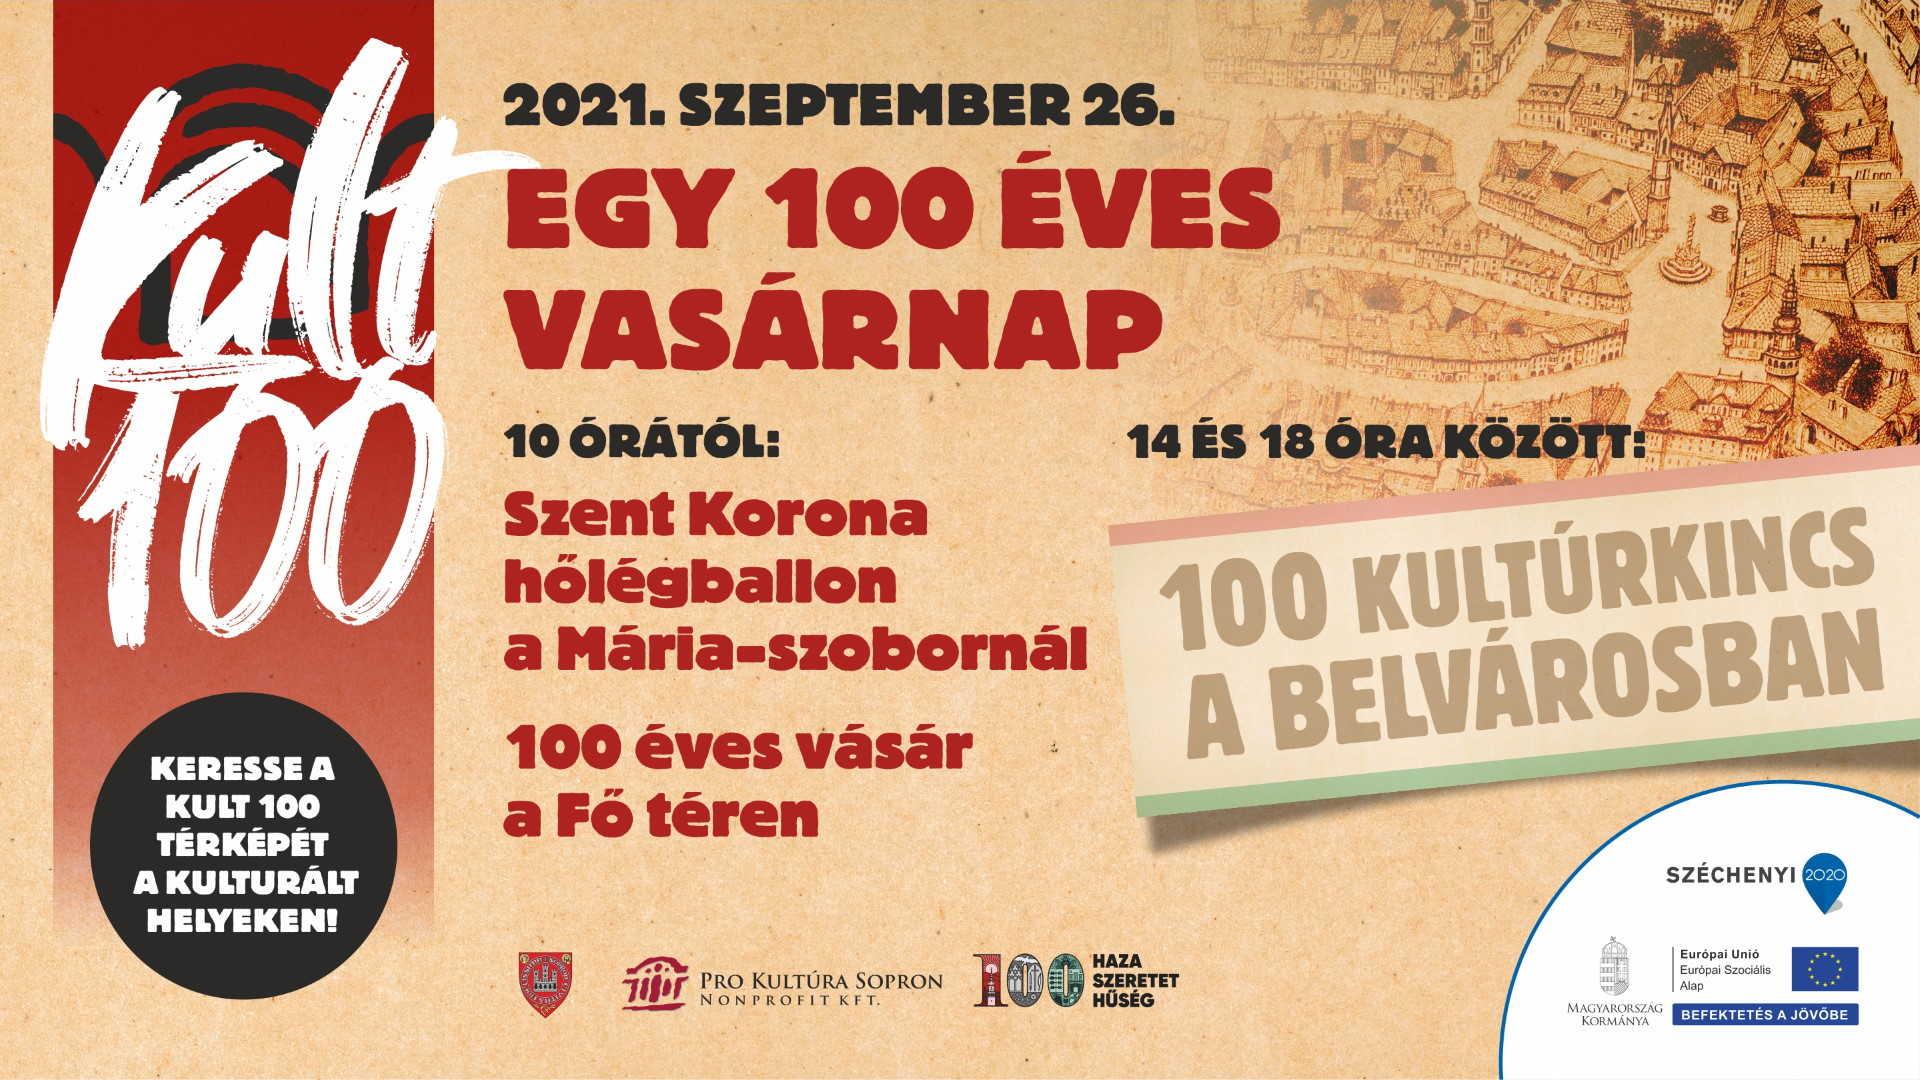 Kult100 plakát